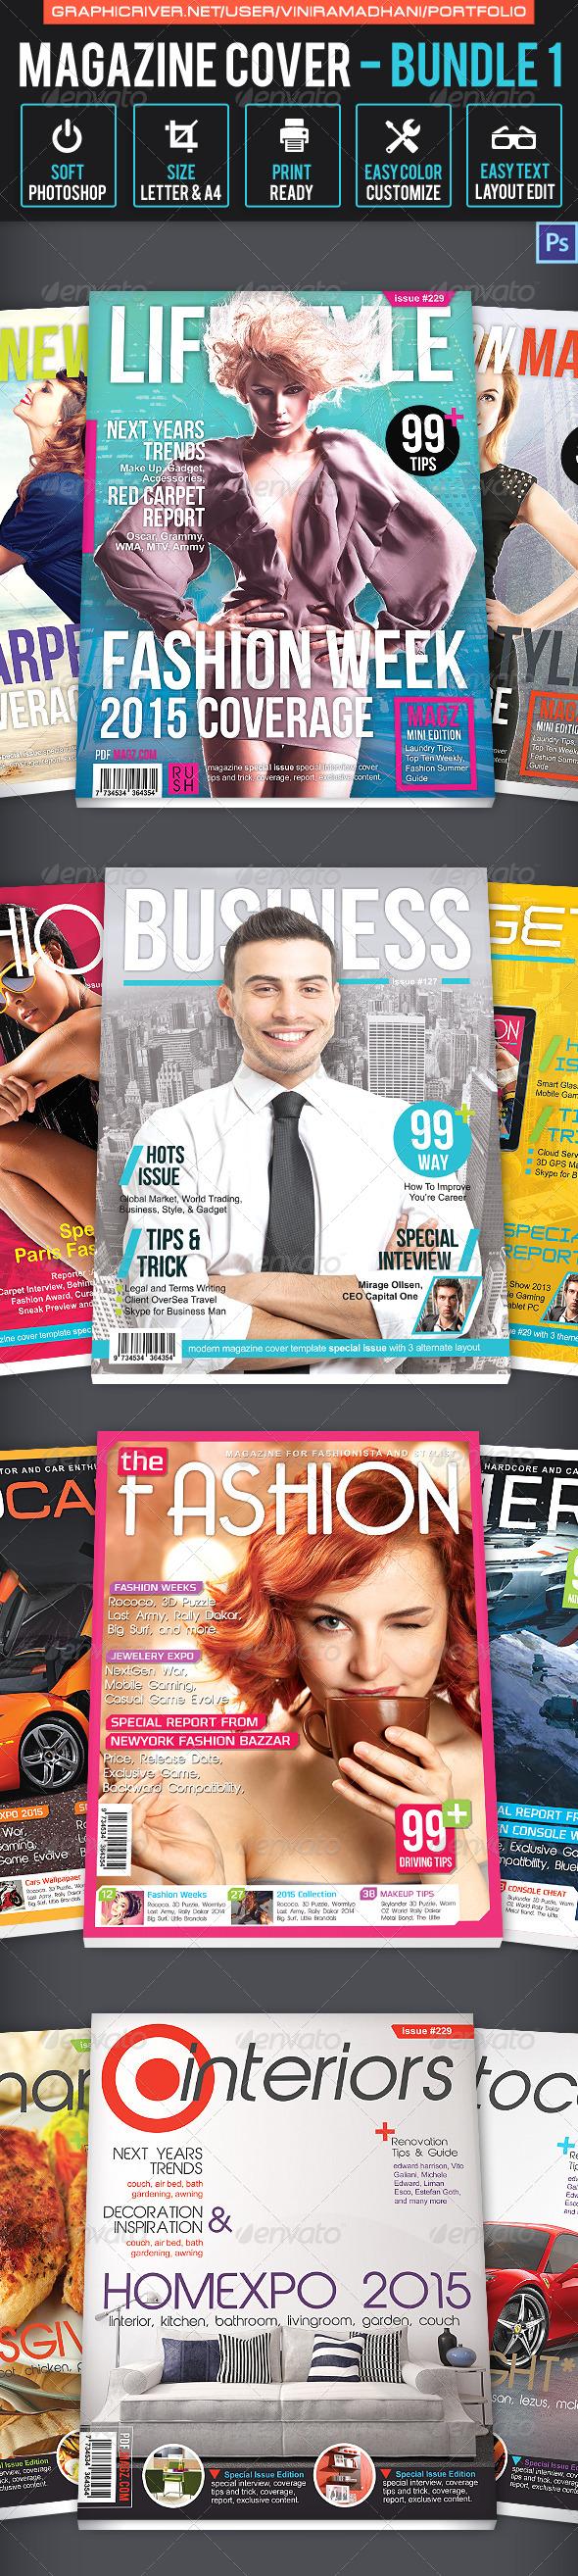 Magazine Cover Bundle 1 - Magazines Print Templates